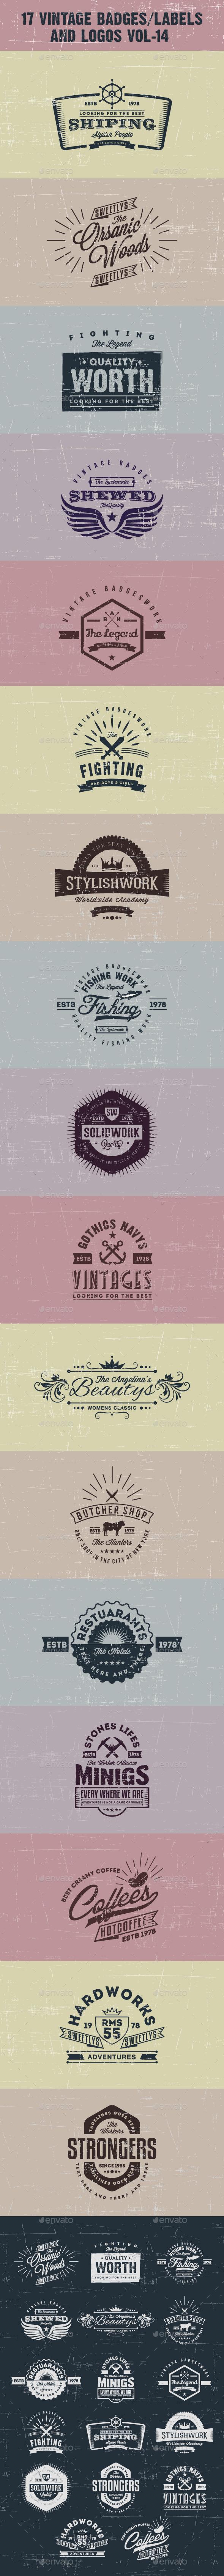 GraphicRiver 17 Vintage Badges labels and Logos Vol-14 9938664